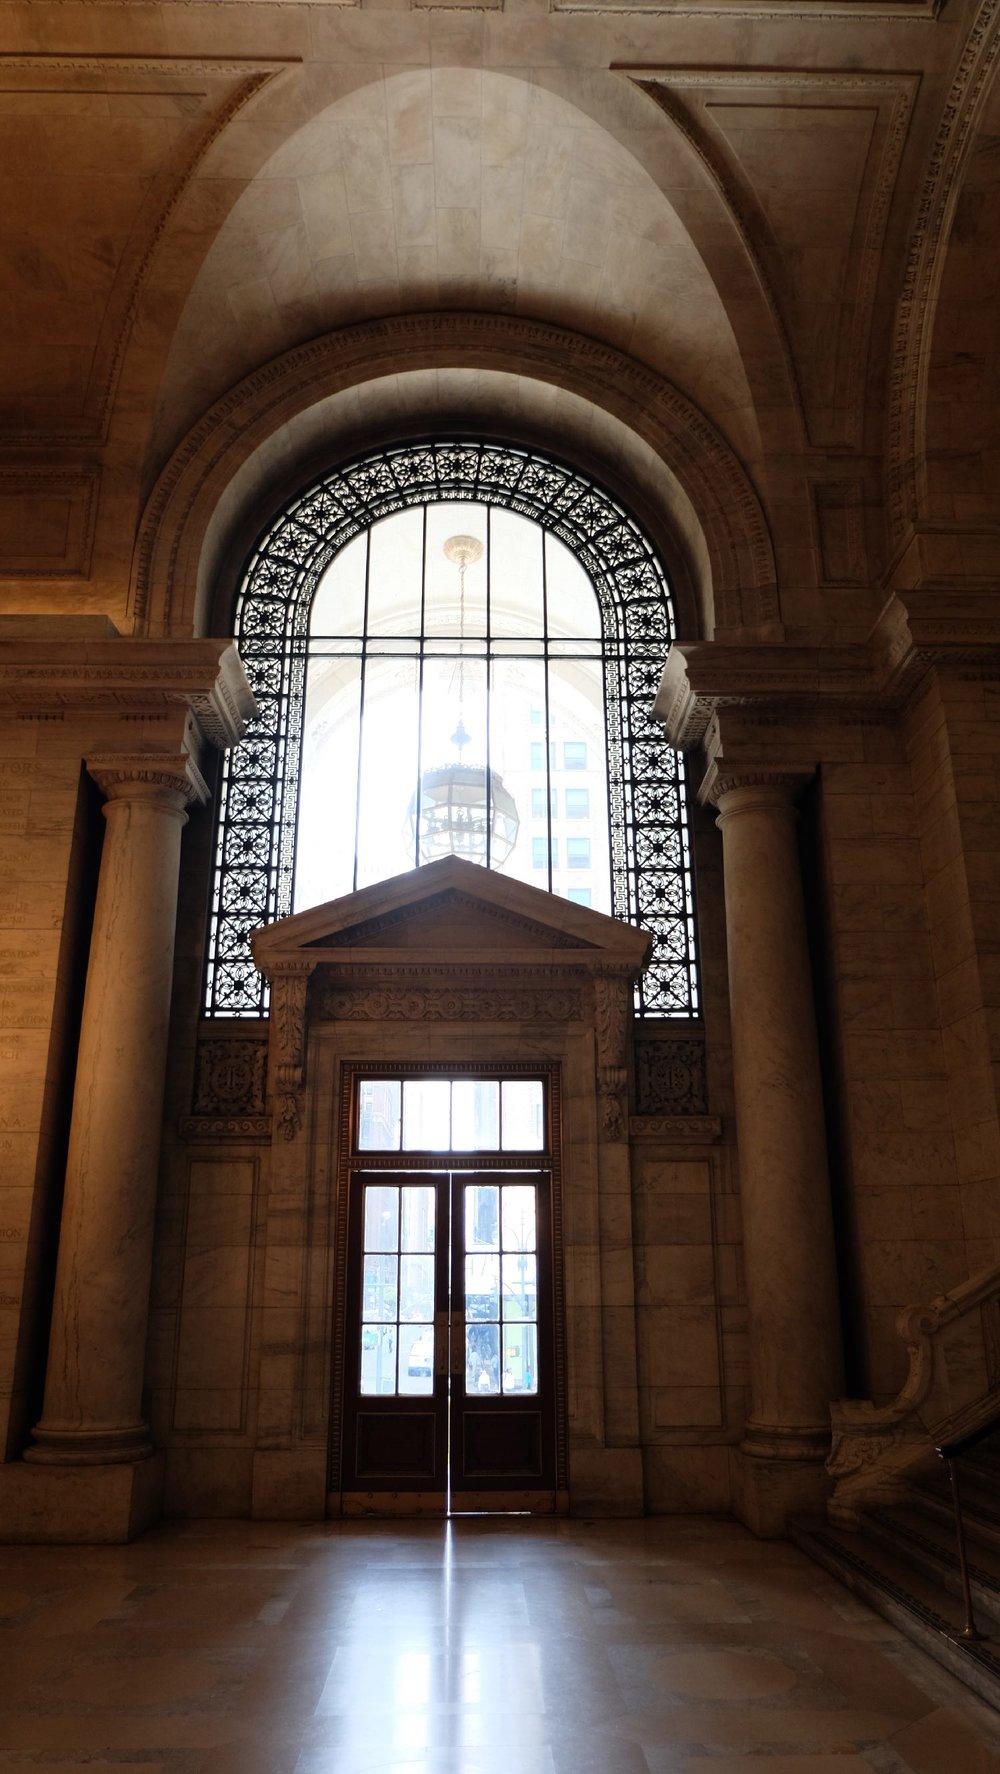 The New York Public Library | Entrance | 19 th century architecture | photo sandrine cohen